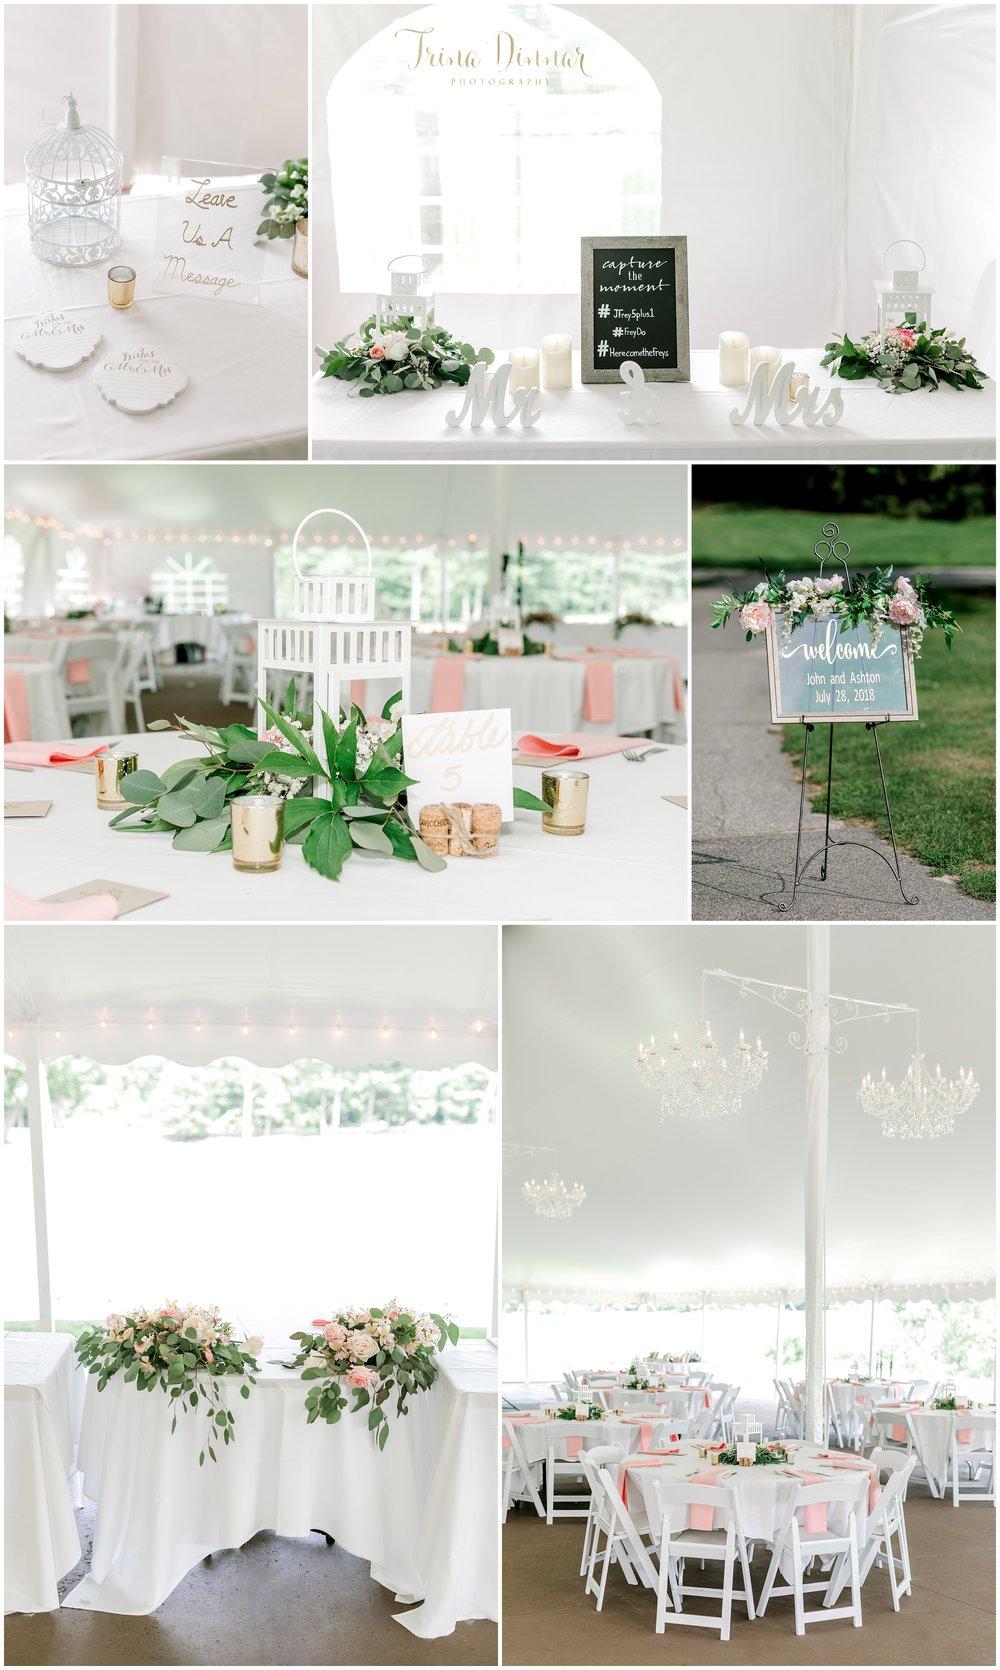 Falmouth Country Club Wedding Reception Tent Decor